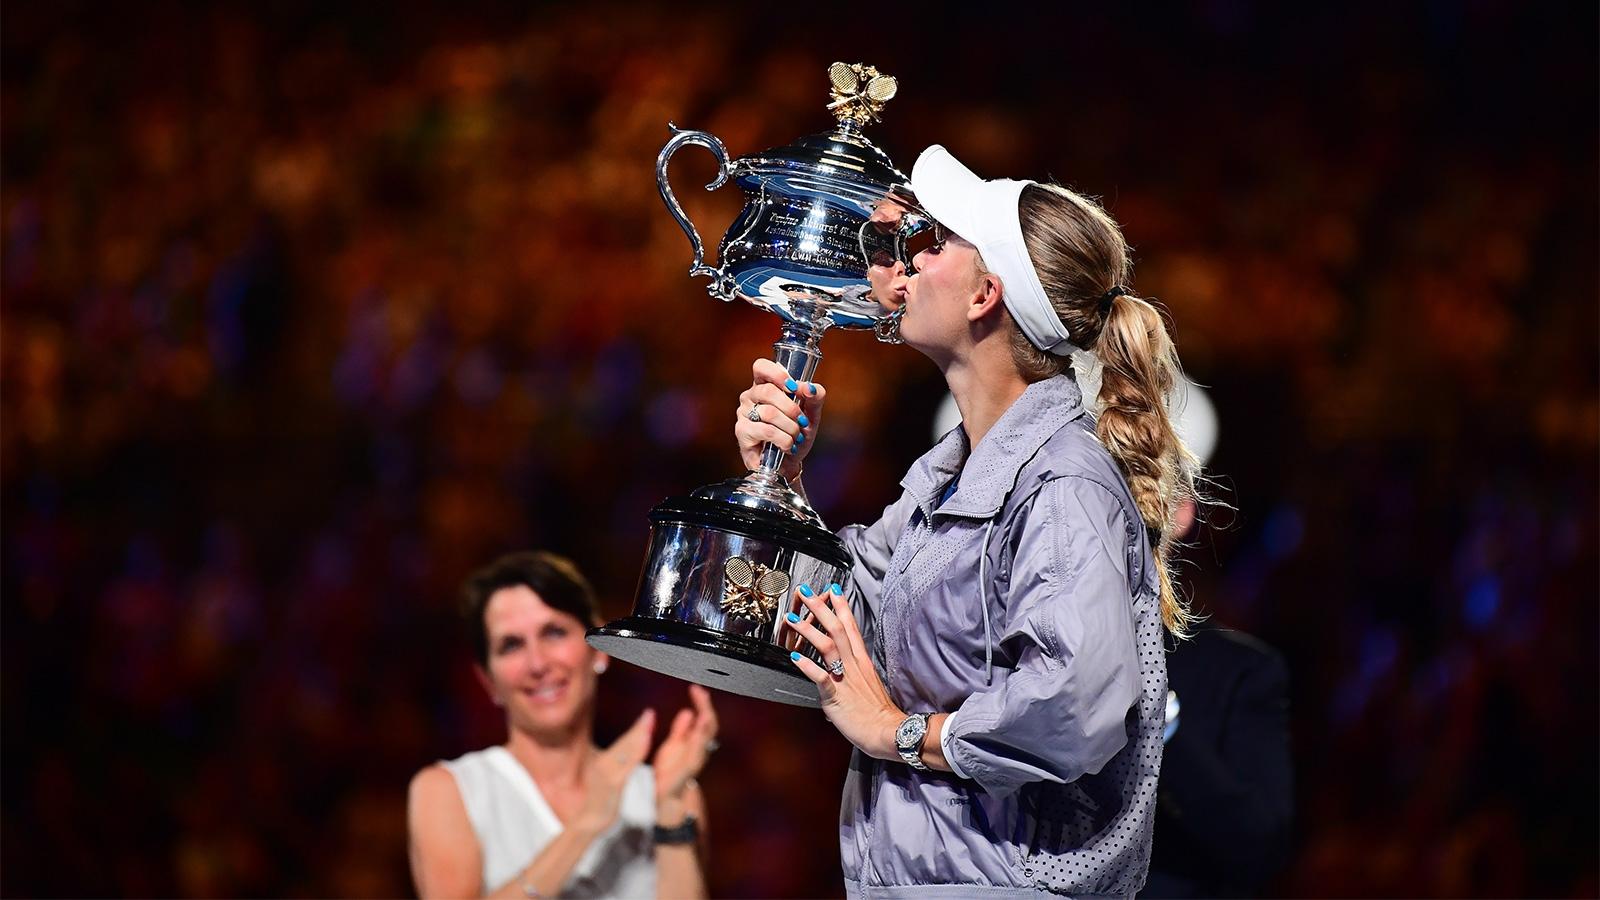 Australian Open 2018 - final Ca - tennisblog | ello